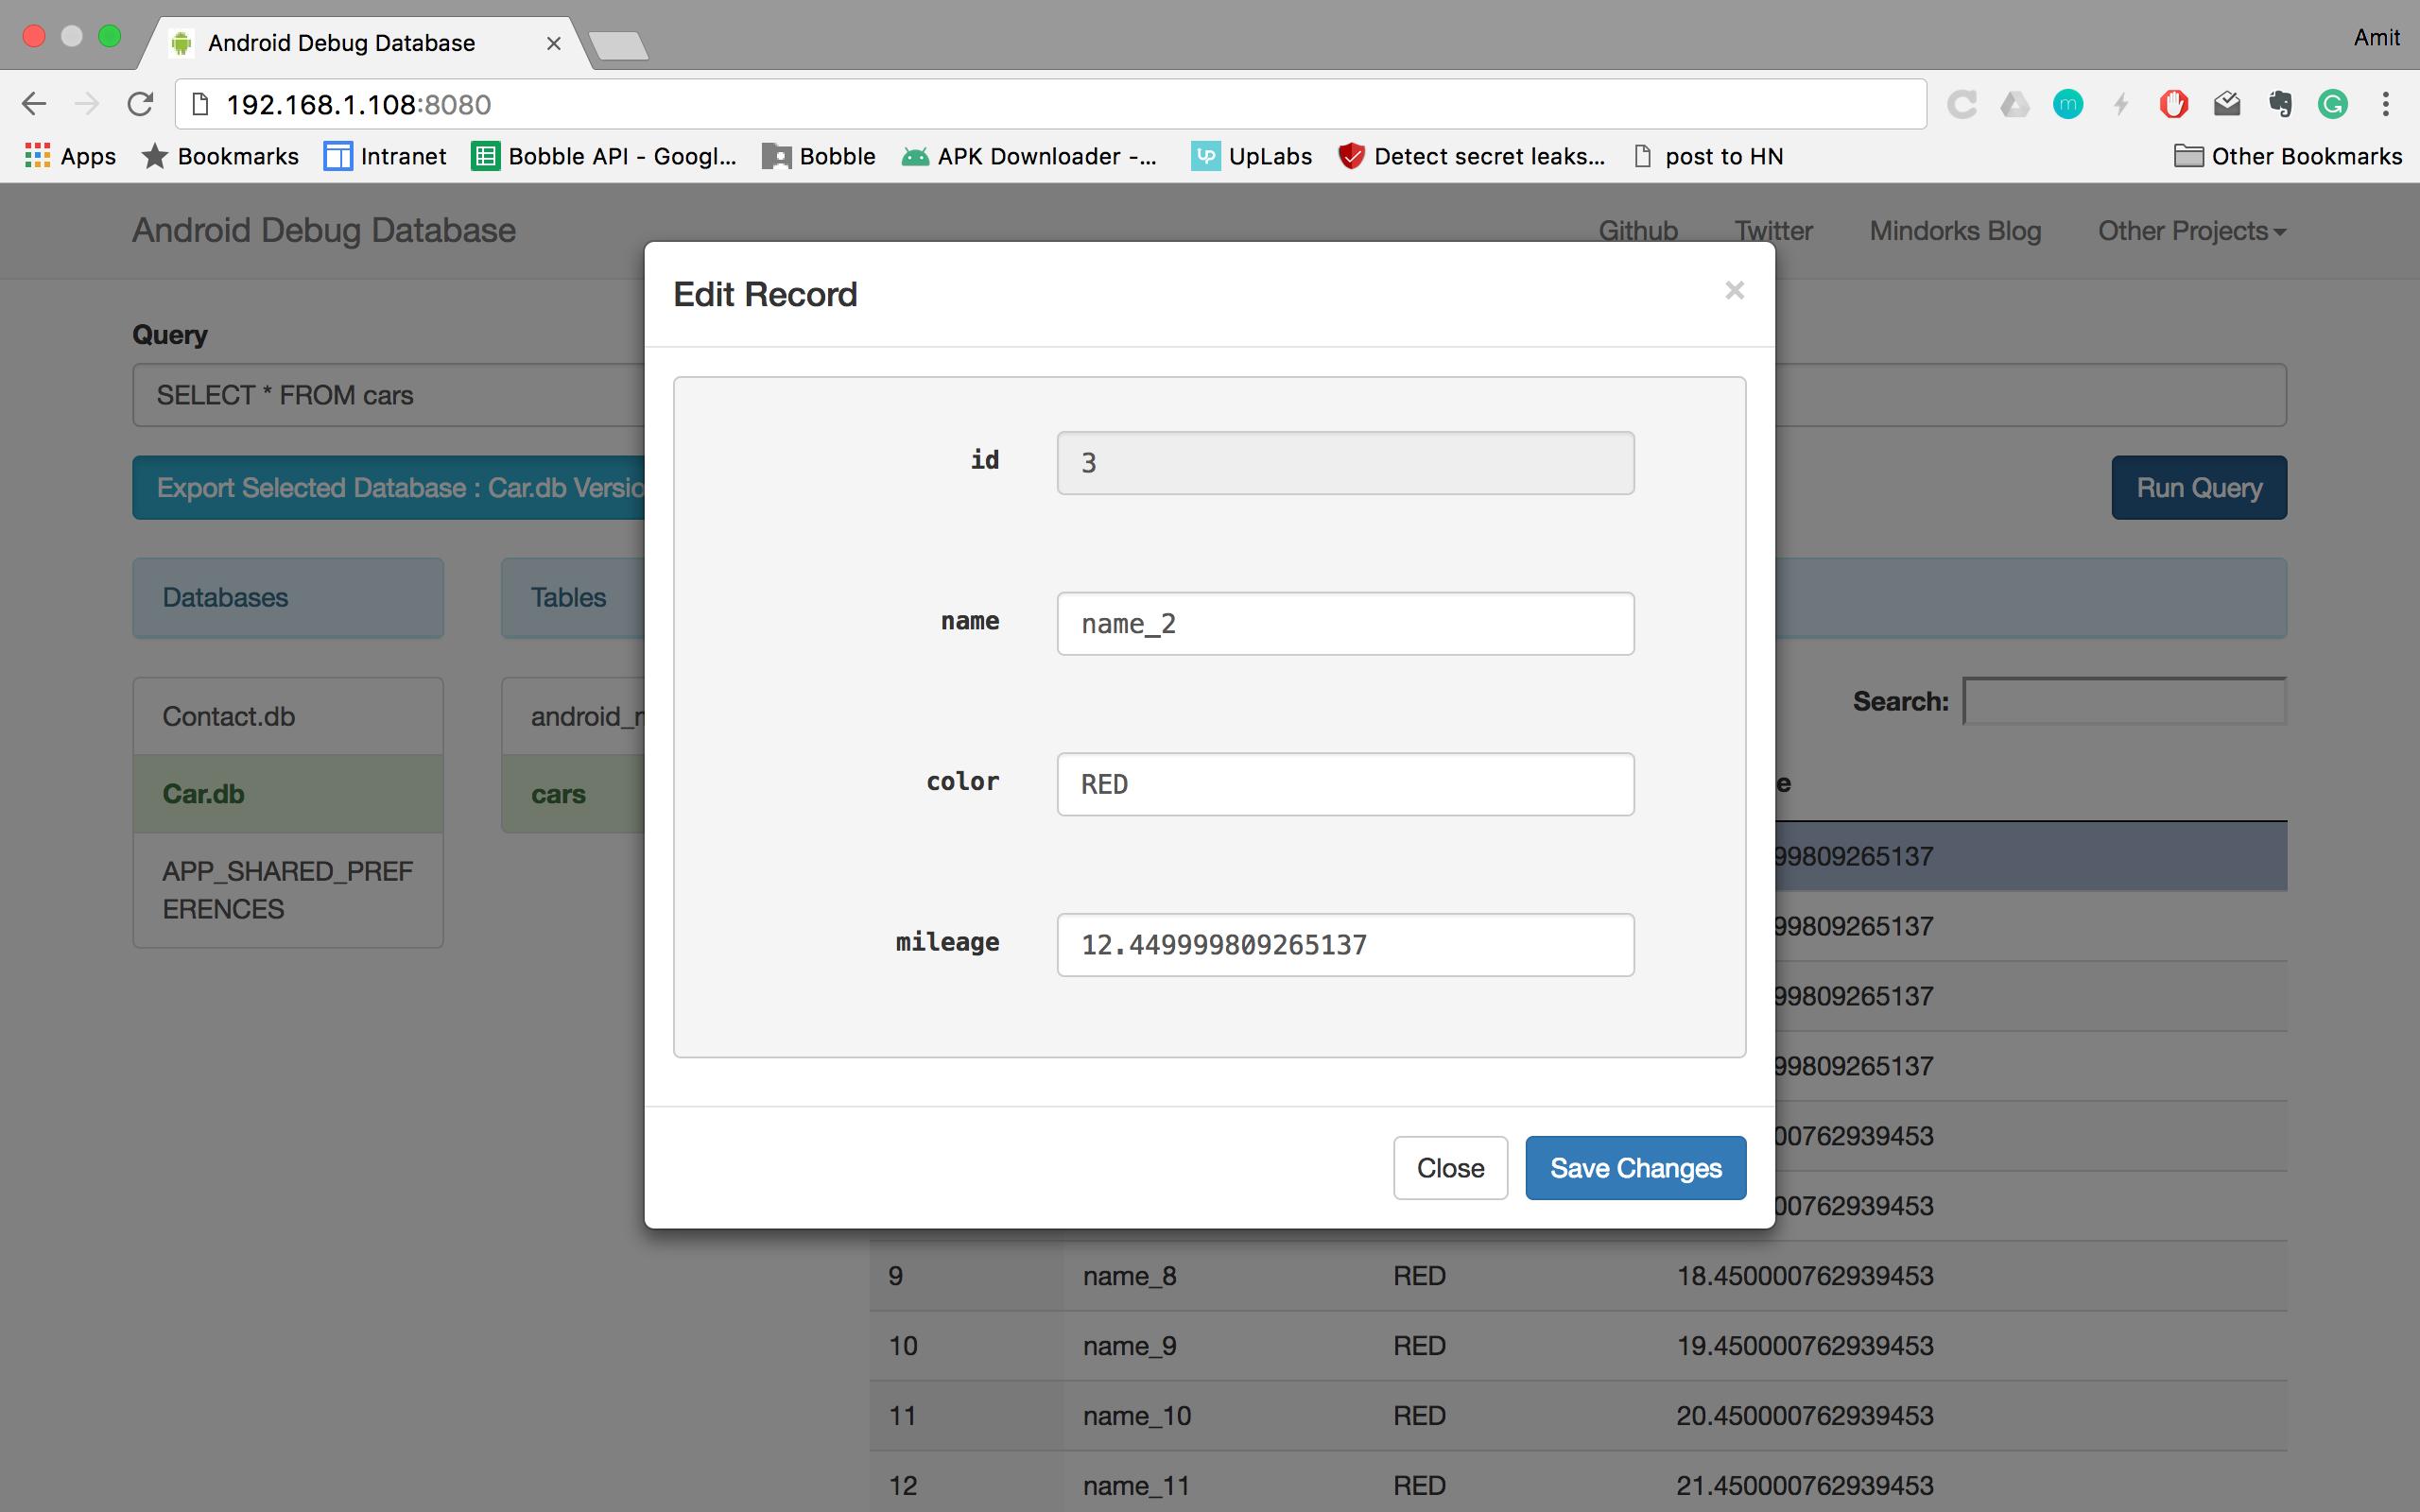 GitHub - amitshekhariitbhu/Android-Debug-Database: A library